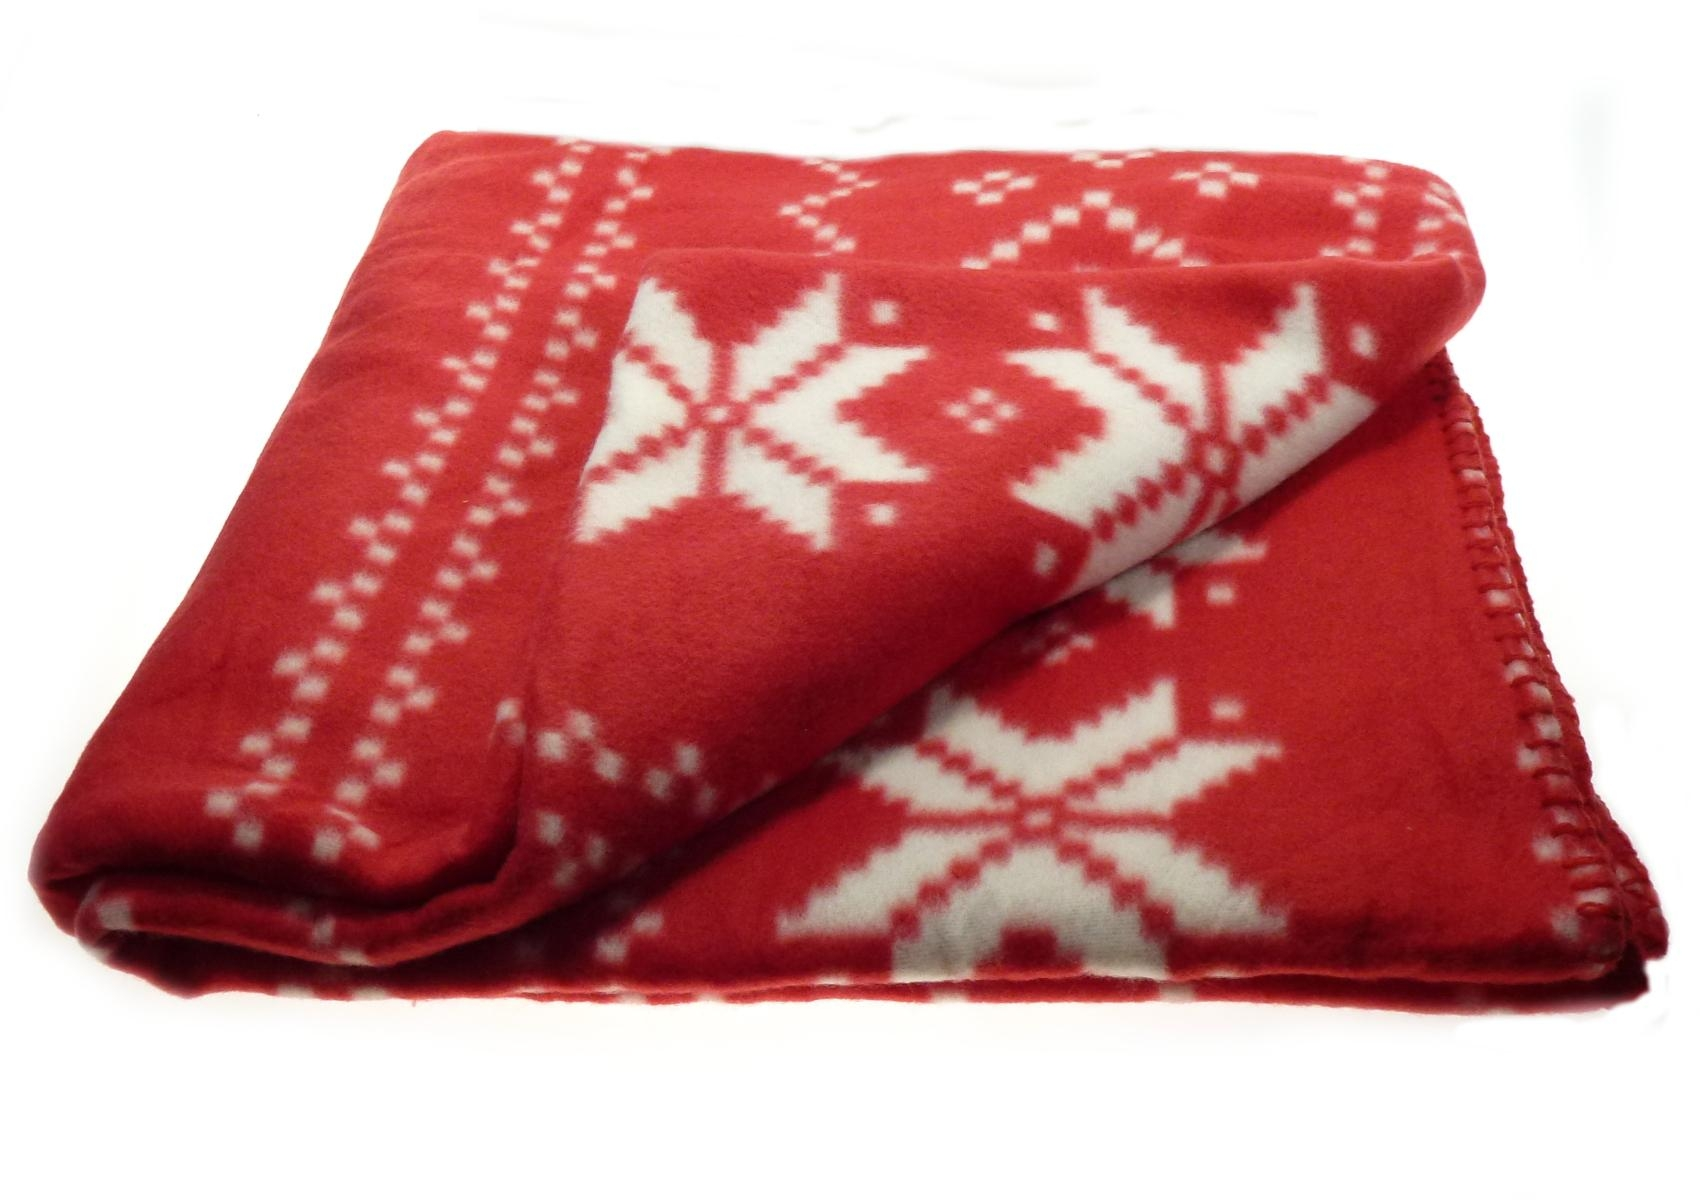 Christmas Soft Fleecy Throw Over Festive Xmas Polar Fleece Bed Intended For Red Sofa Throws (Image 1 of 22)